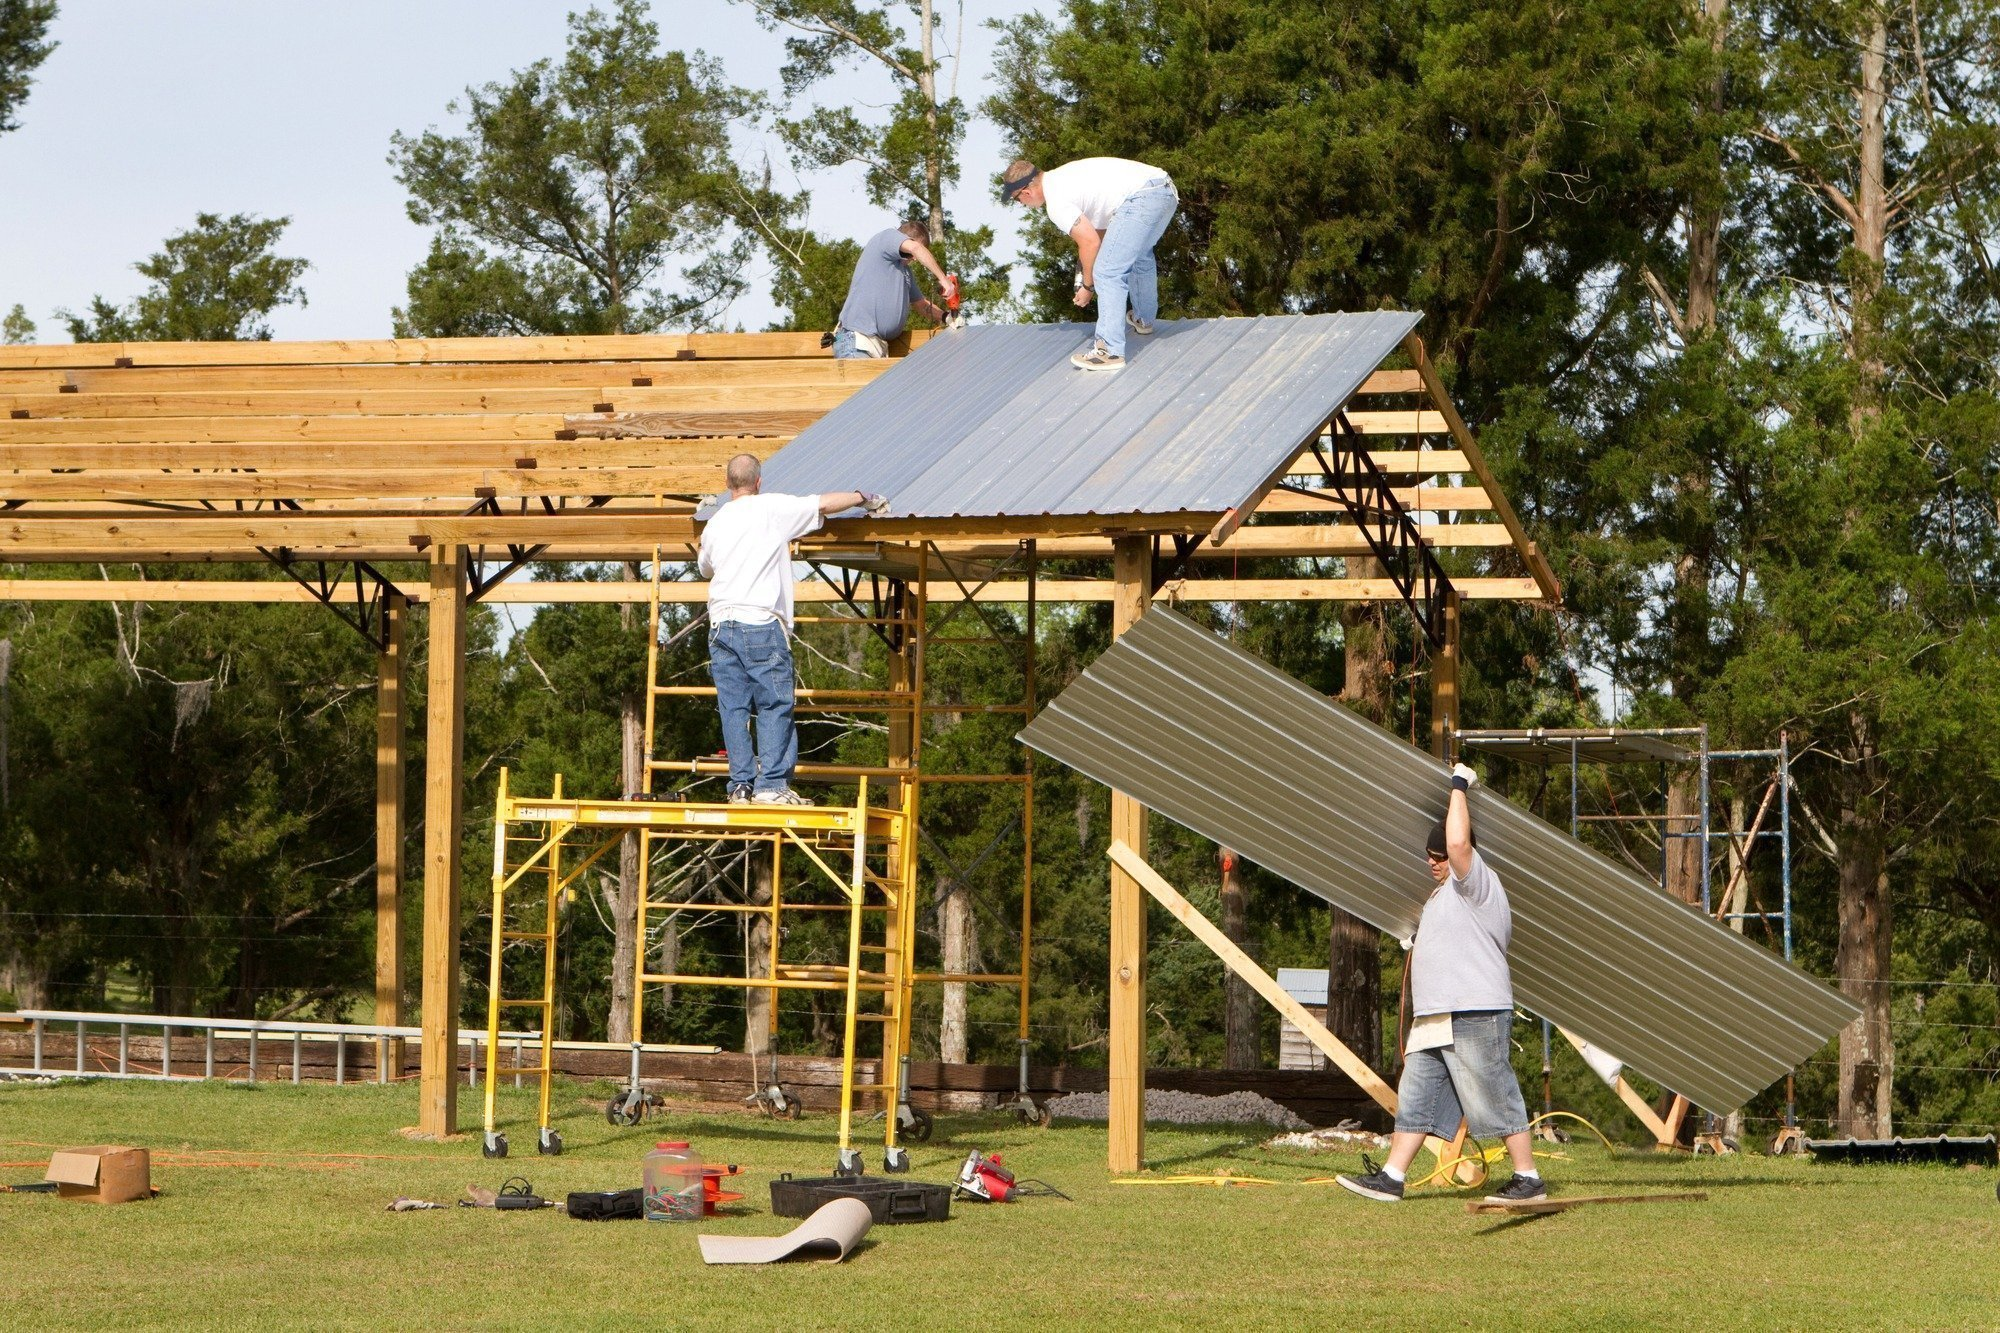 The Essential Checklist for Hiring a Pole Barn Builder